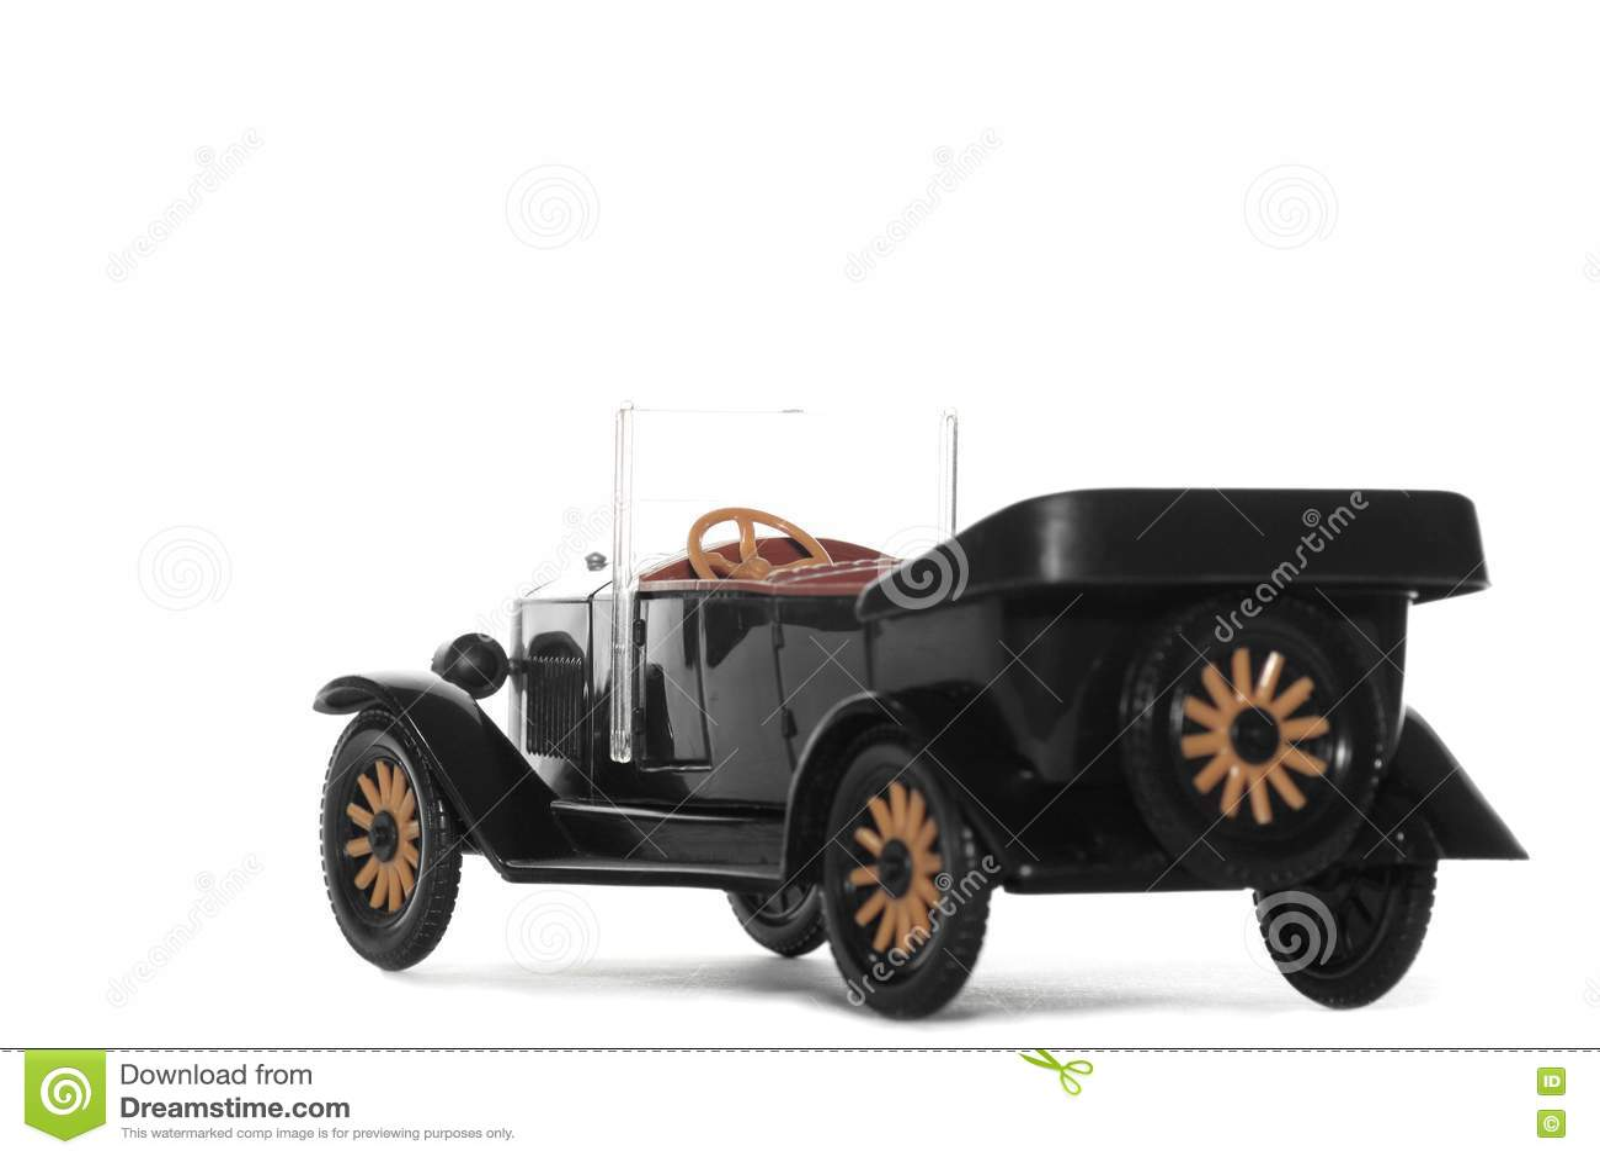 old toy car volvo jakob 1927 stock photo image of 1927. Black Bedroom Furniture Sets. Home Design Ideas